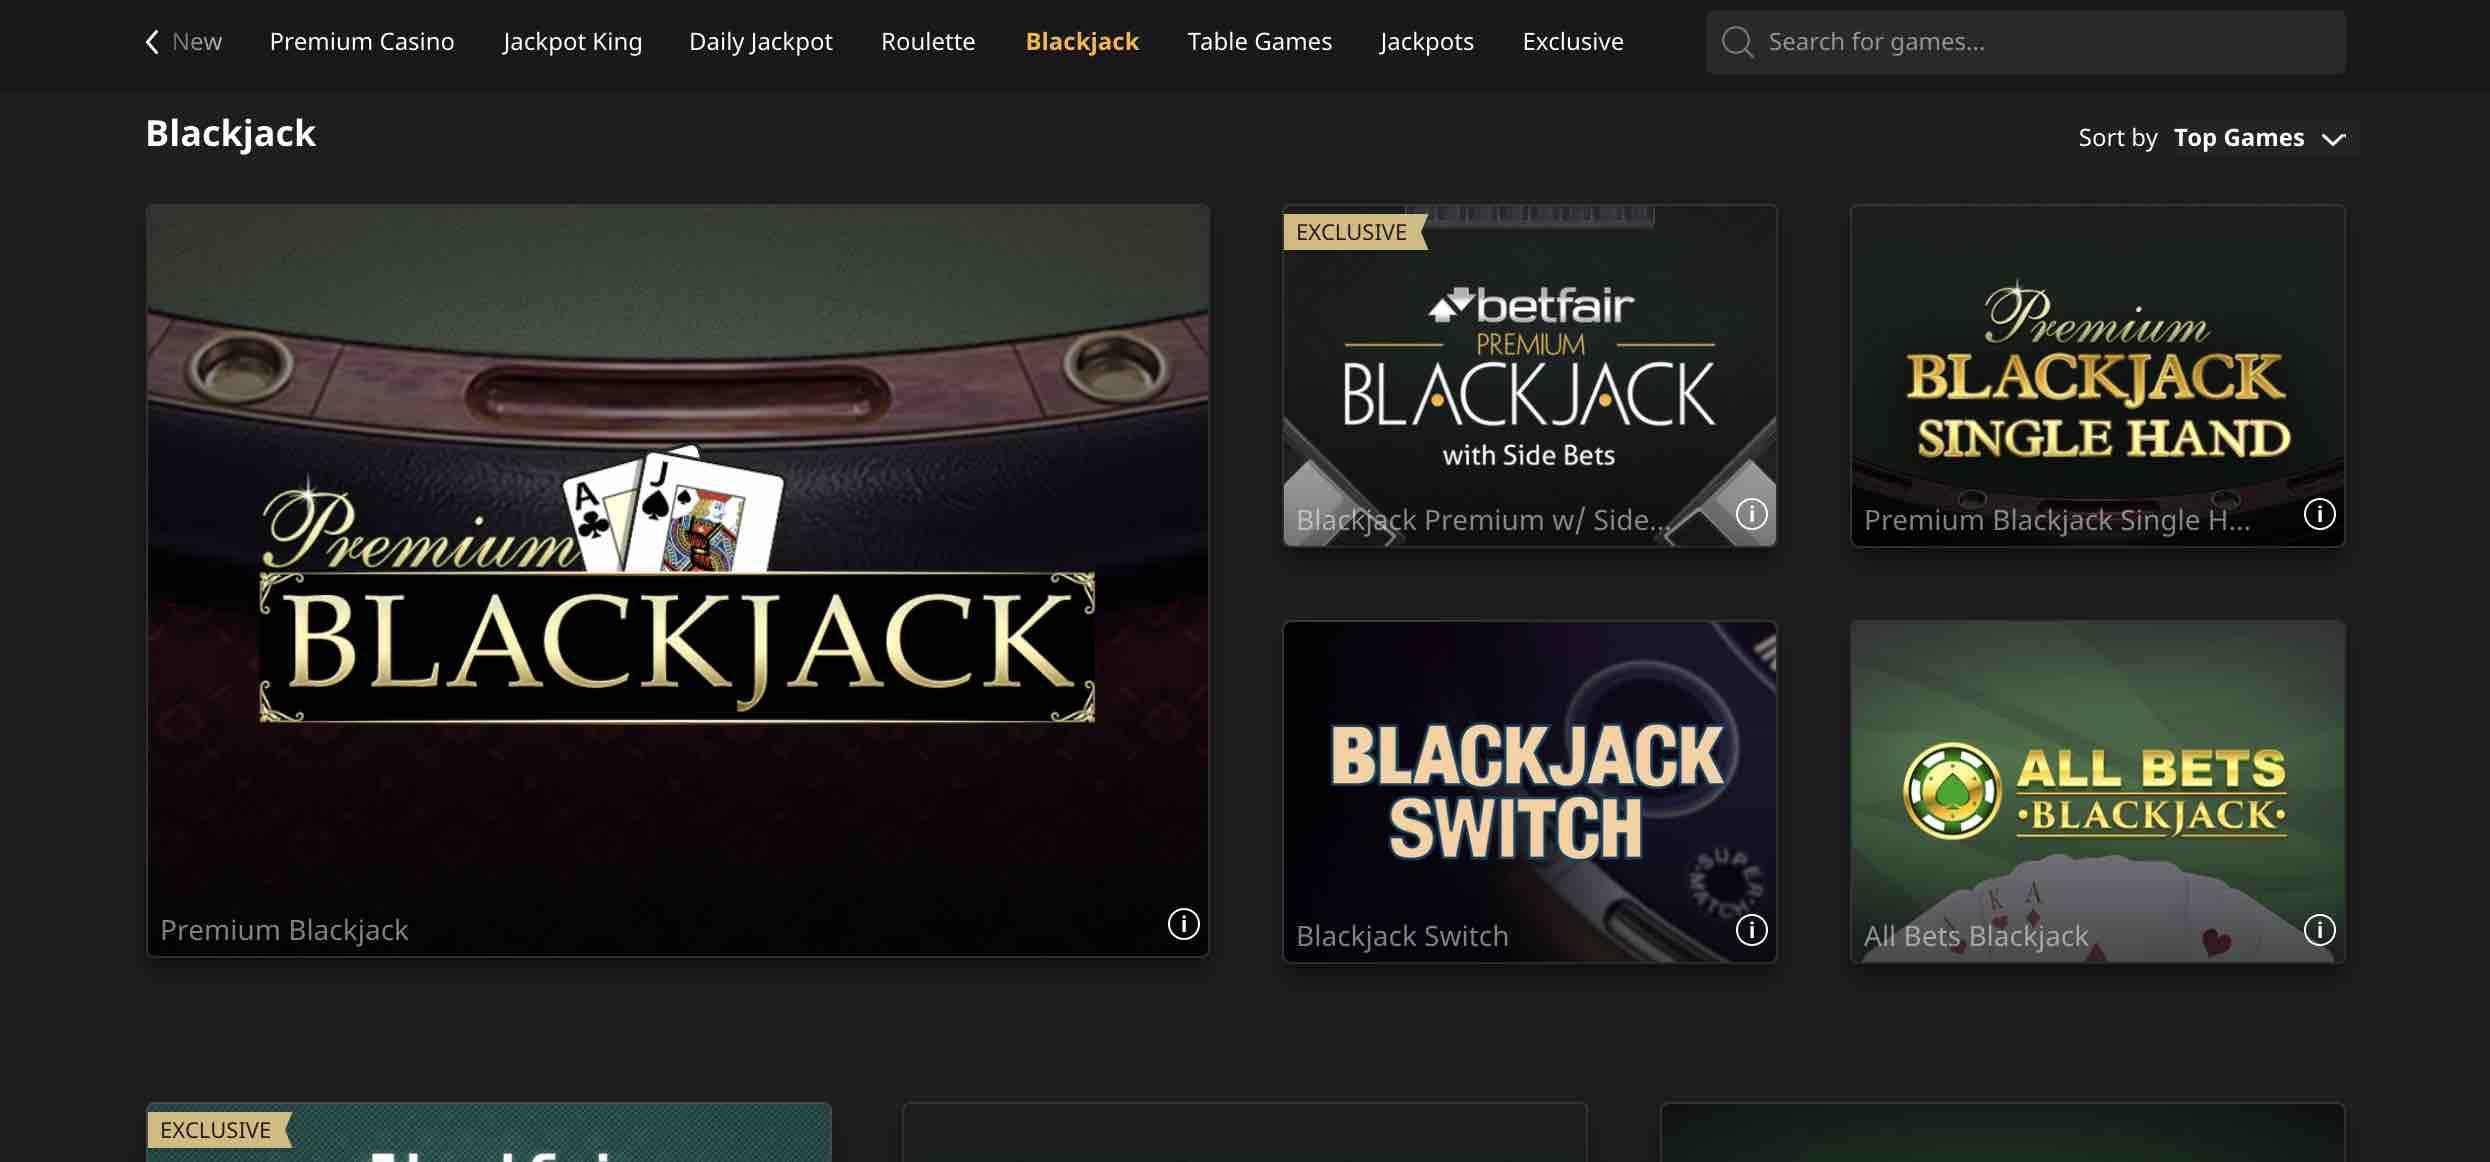 Best Games at Betfair Casino